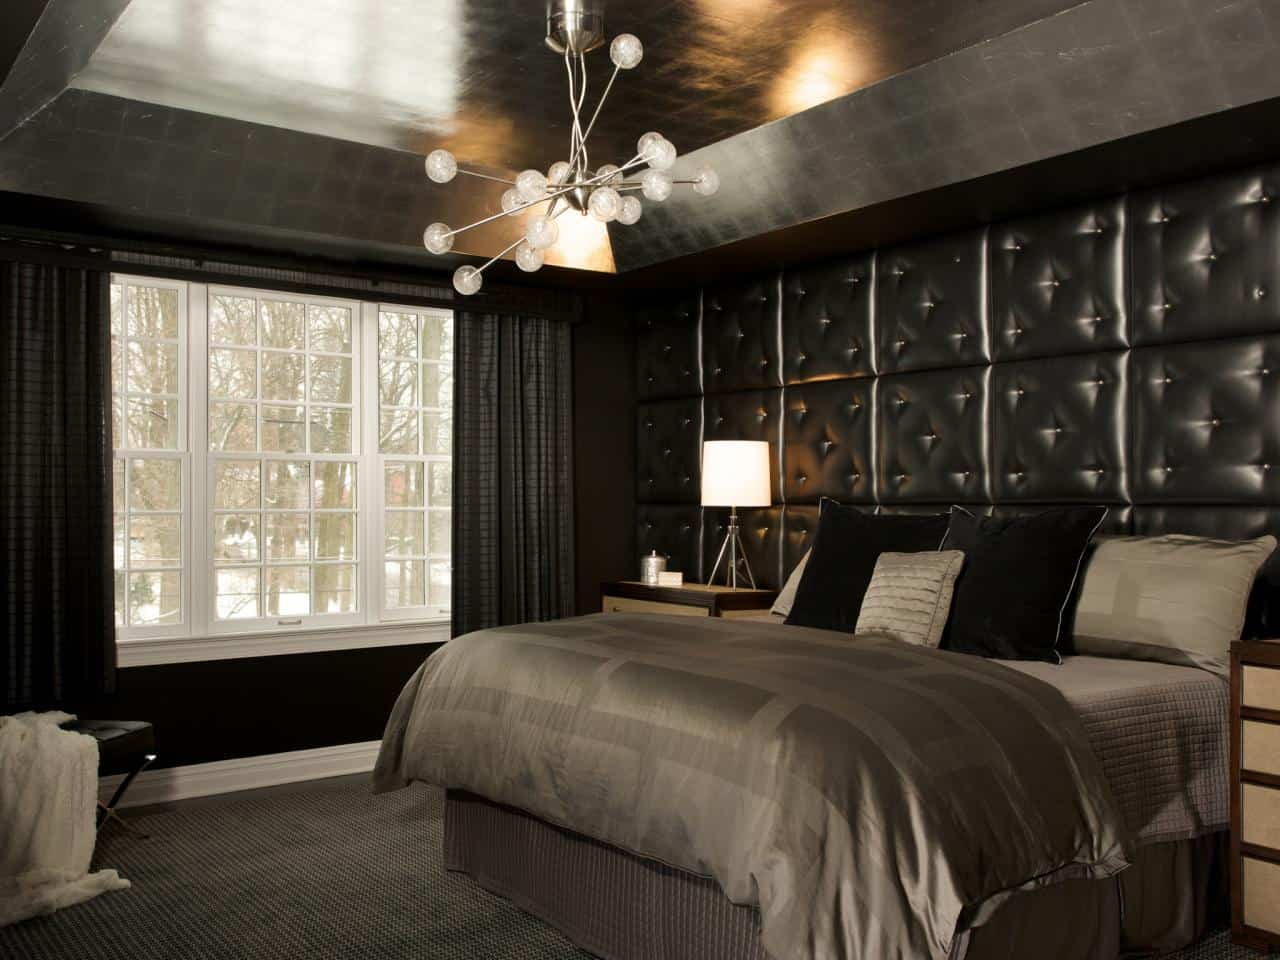 bedroom lighting options. Sputnik Chandelier Bedroom Lighting Options